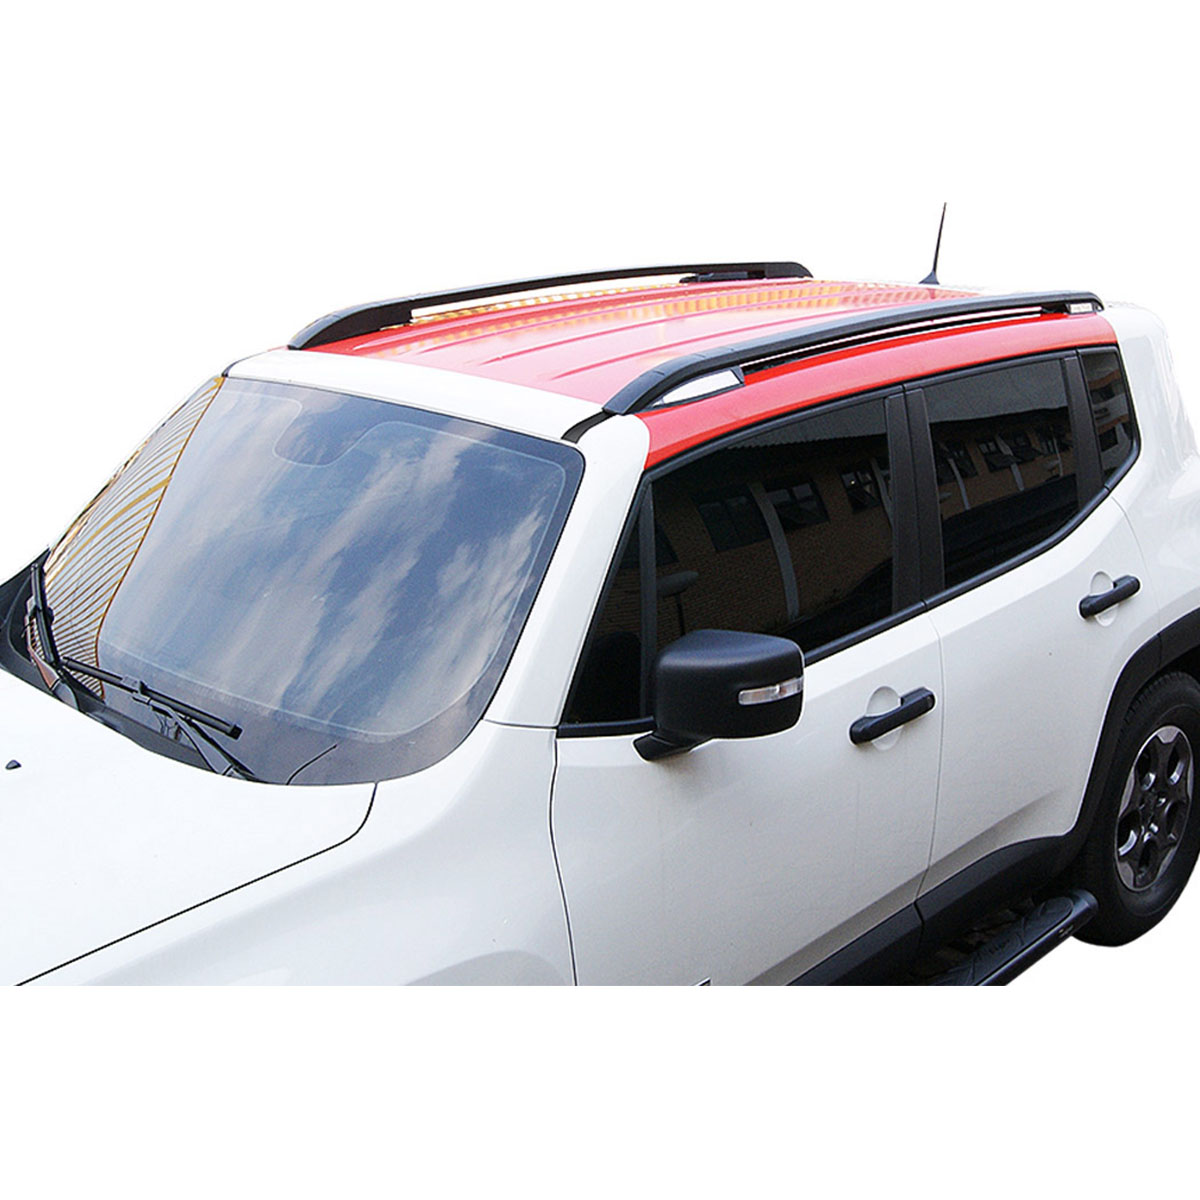 Longarina de teto Bepo Elite preta Jeep Renegade 2016 a 2021